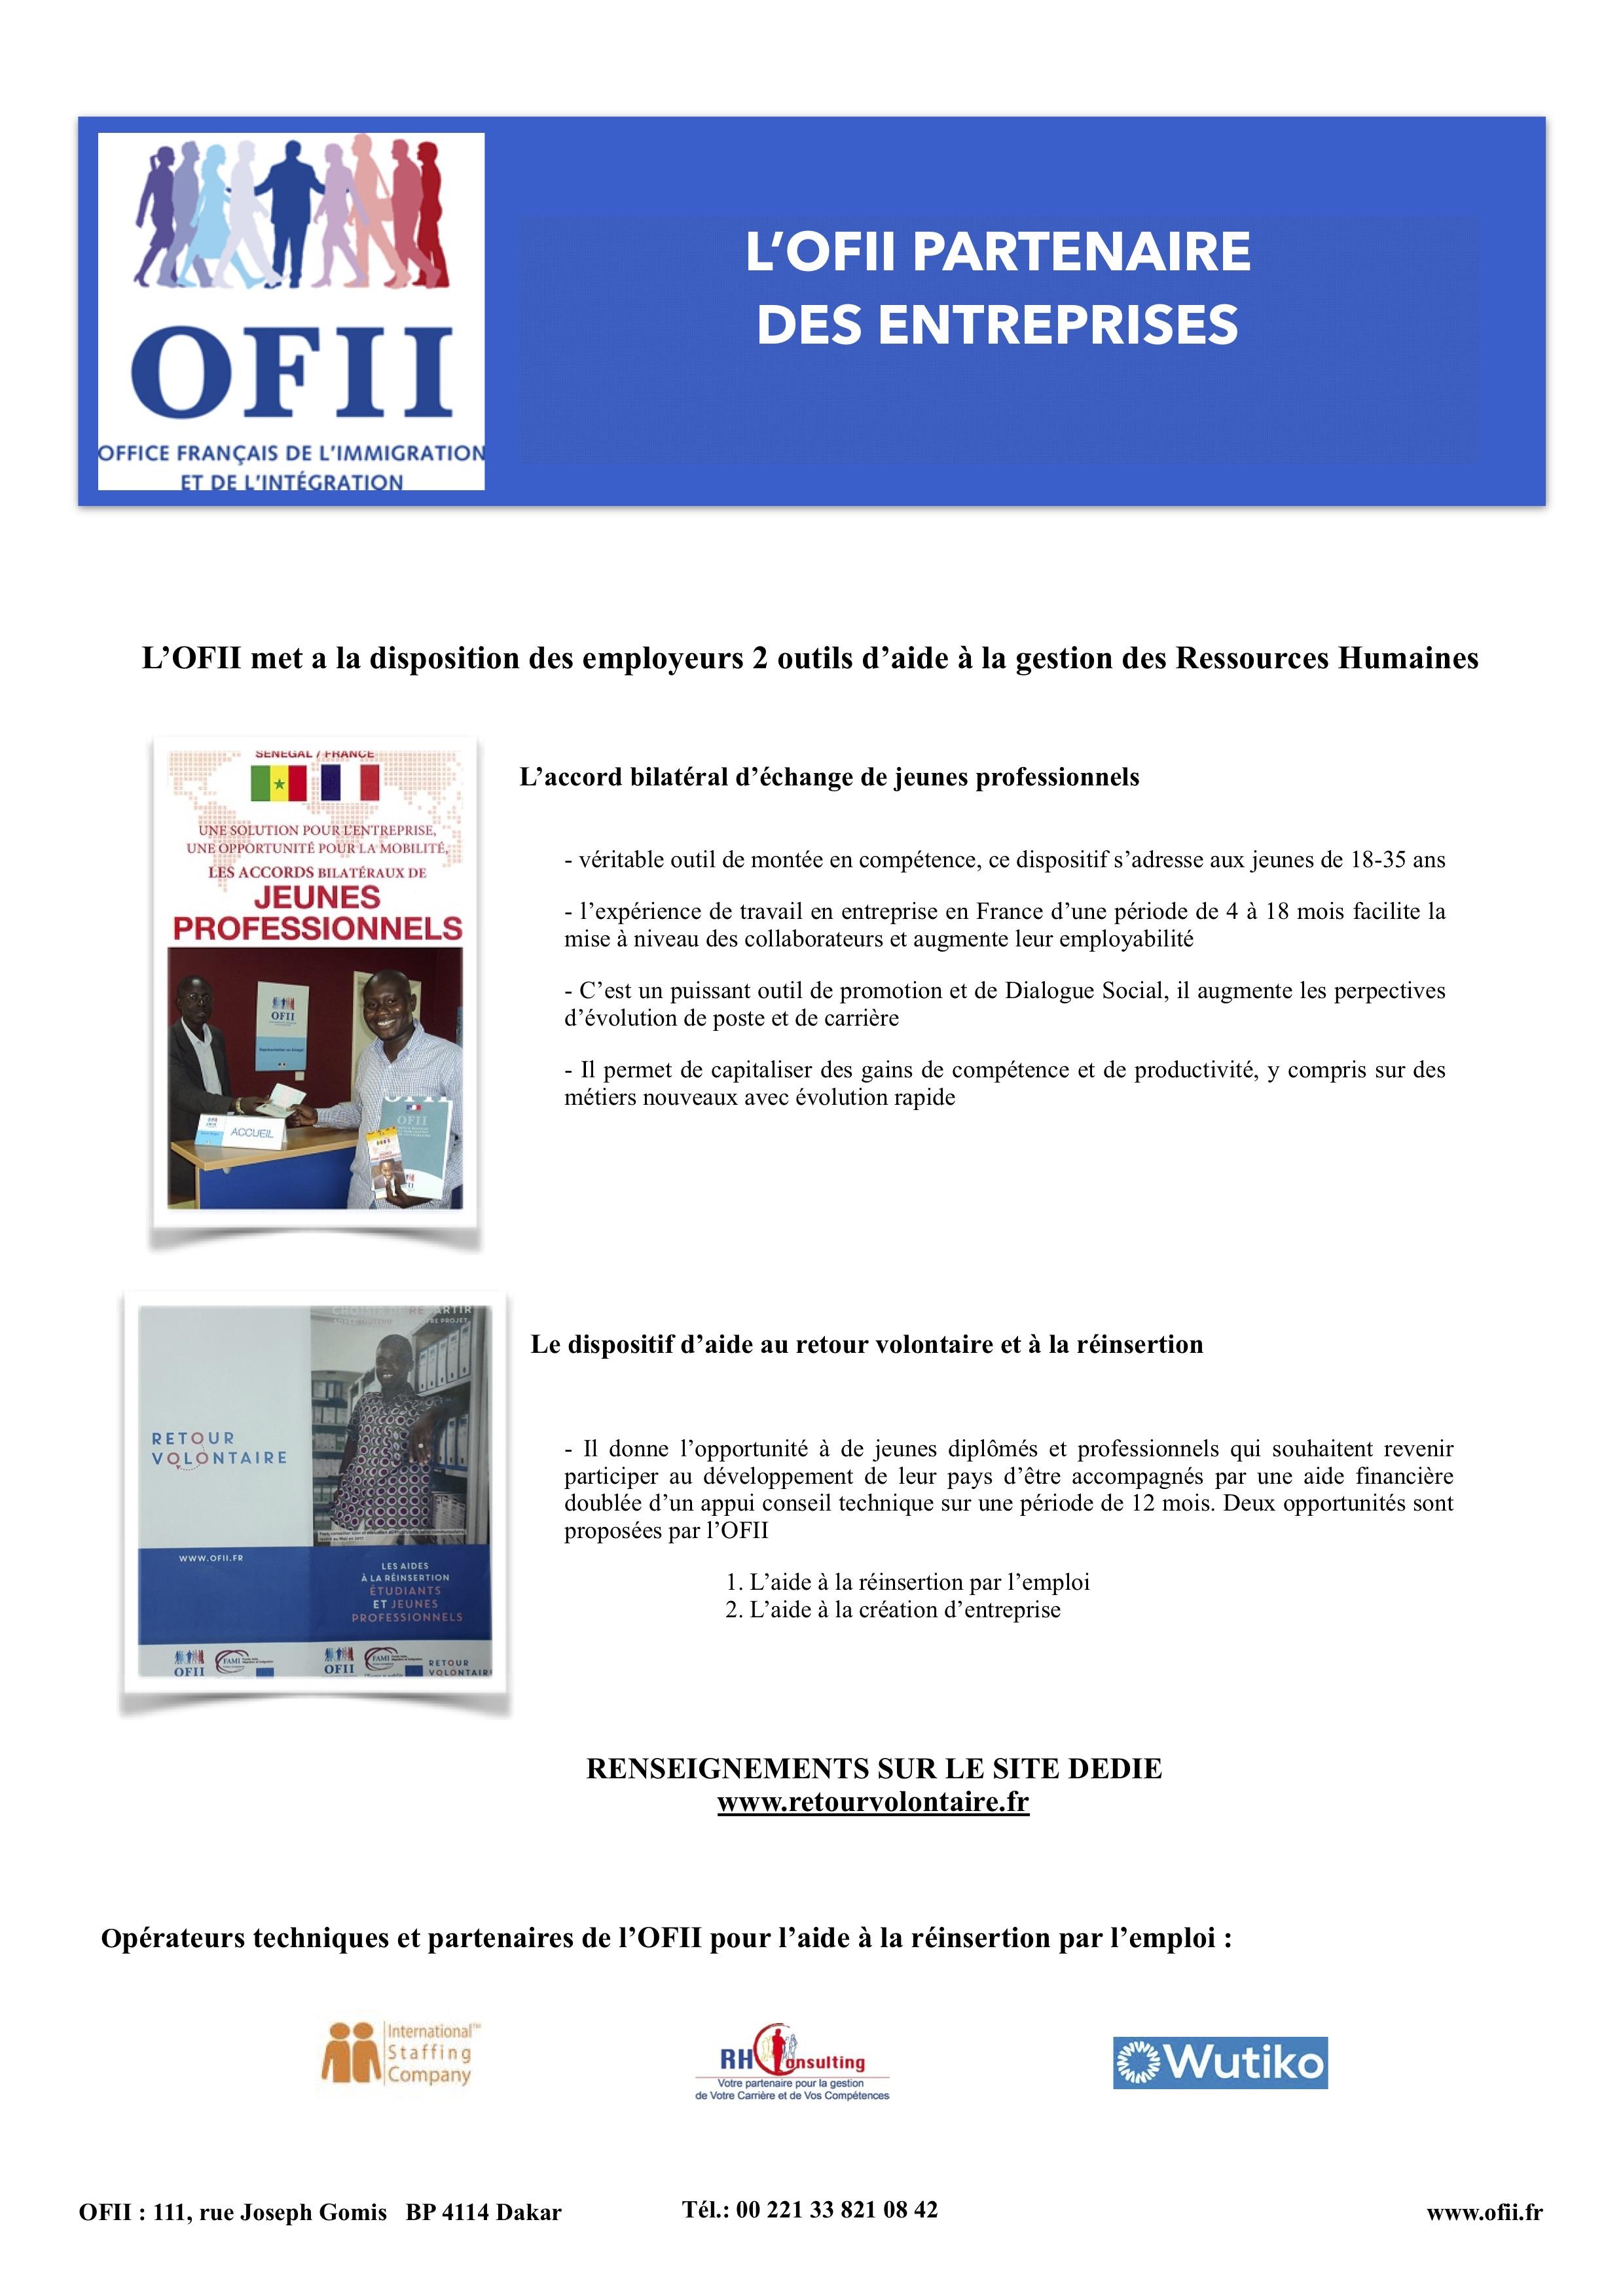 3_OFII = Edition CNP 2018 - V3.jpg